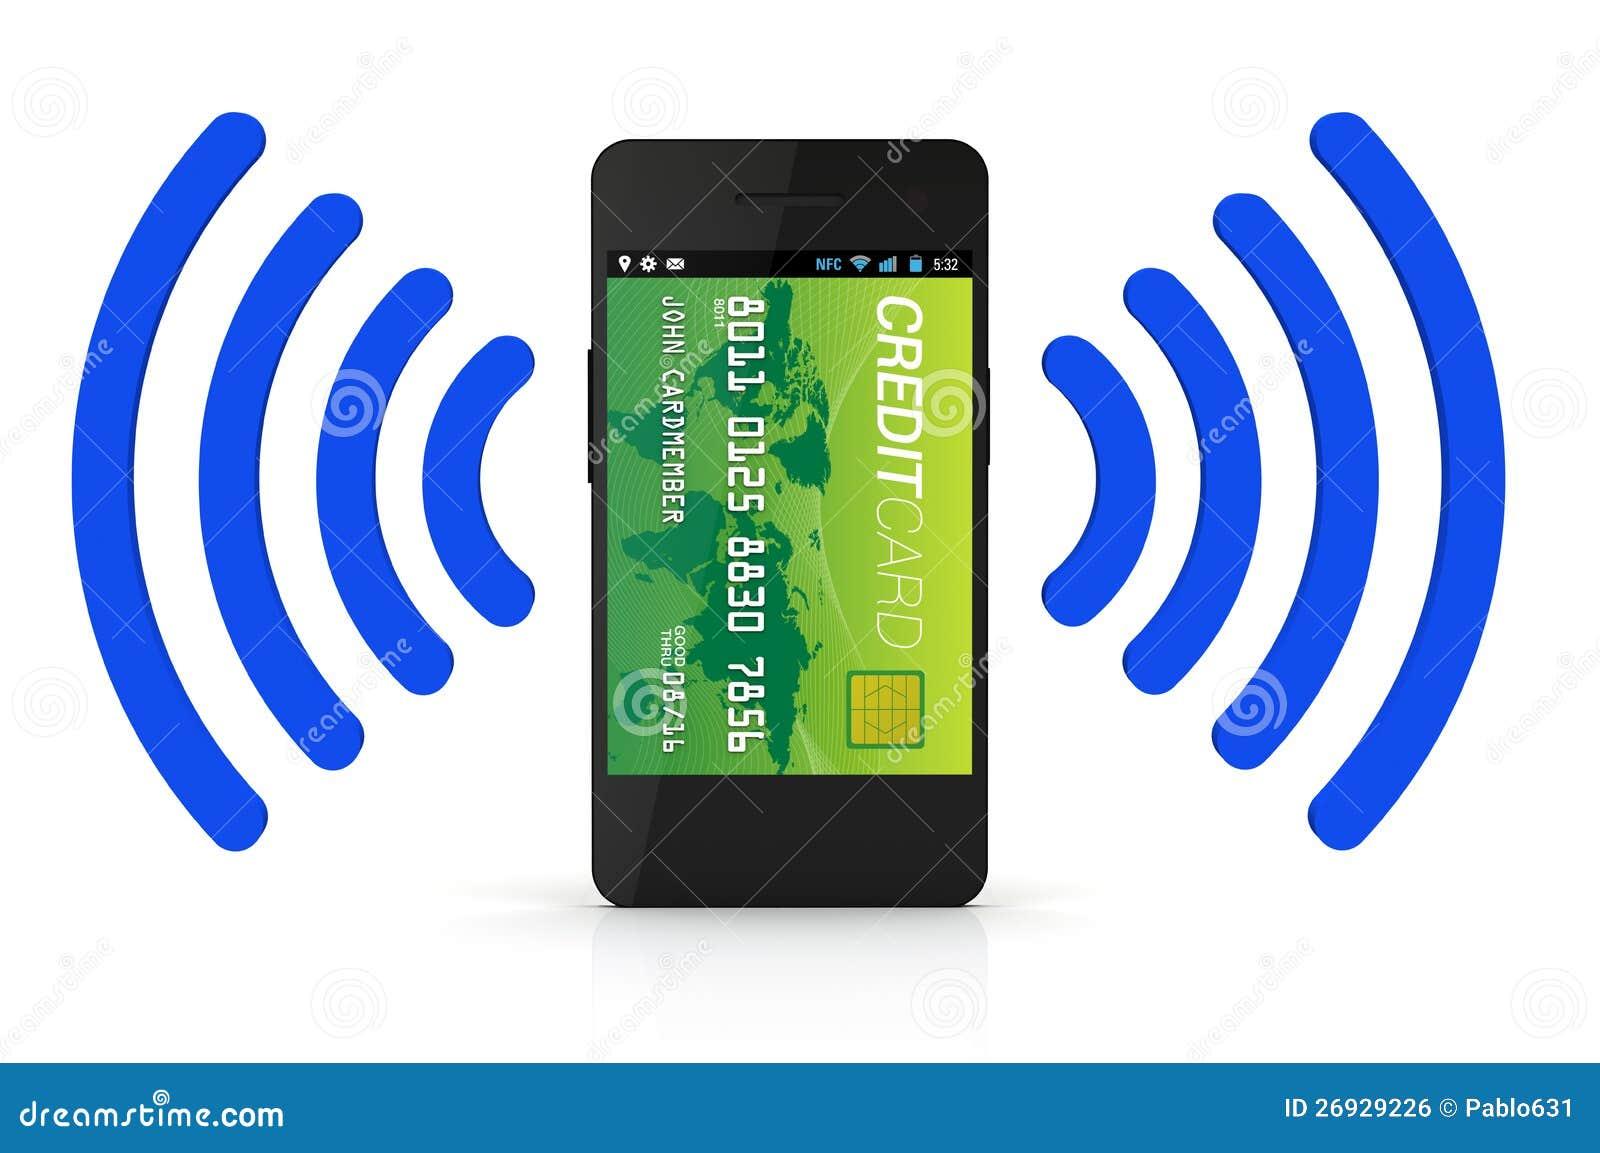 NFC Digital Wallet